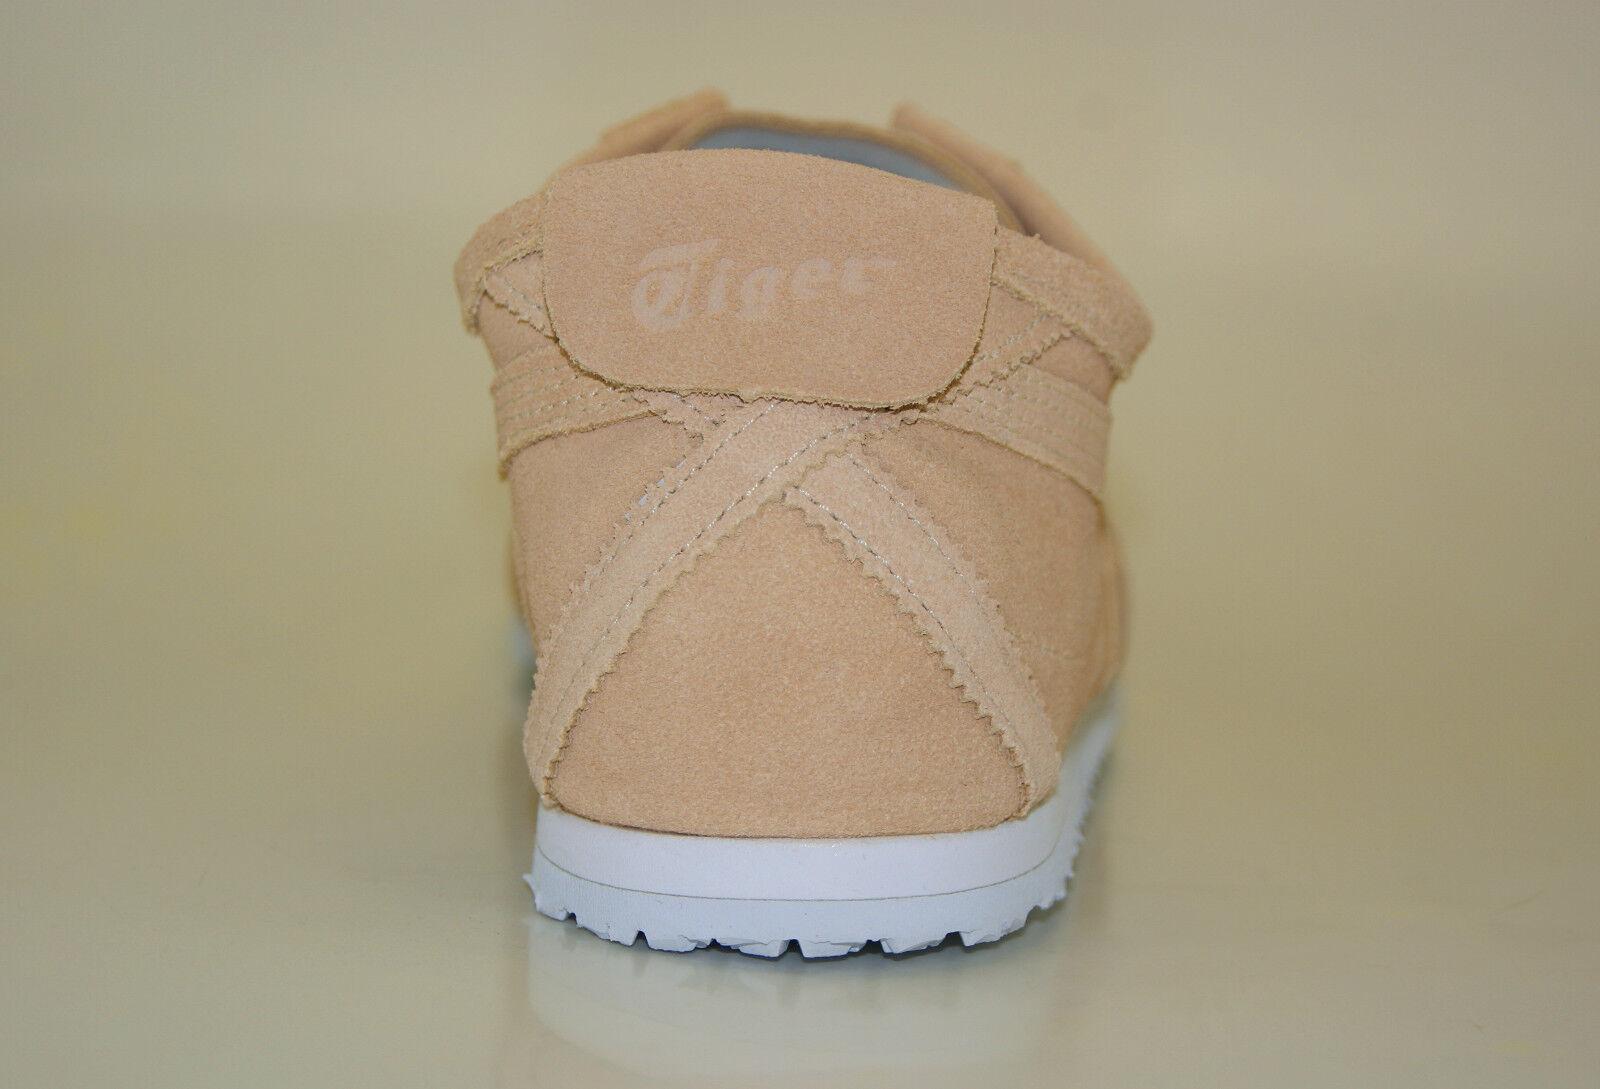 Onitsuka Tiger Sportschuhe by Asics Mexico 66 Turnschuhe Sportschuhe Tiger Herren Damen Sneakers 31da29